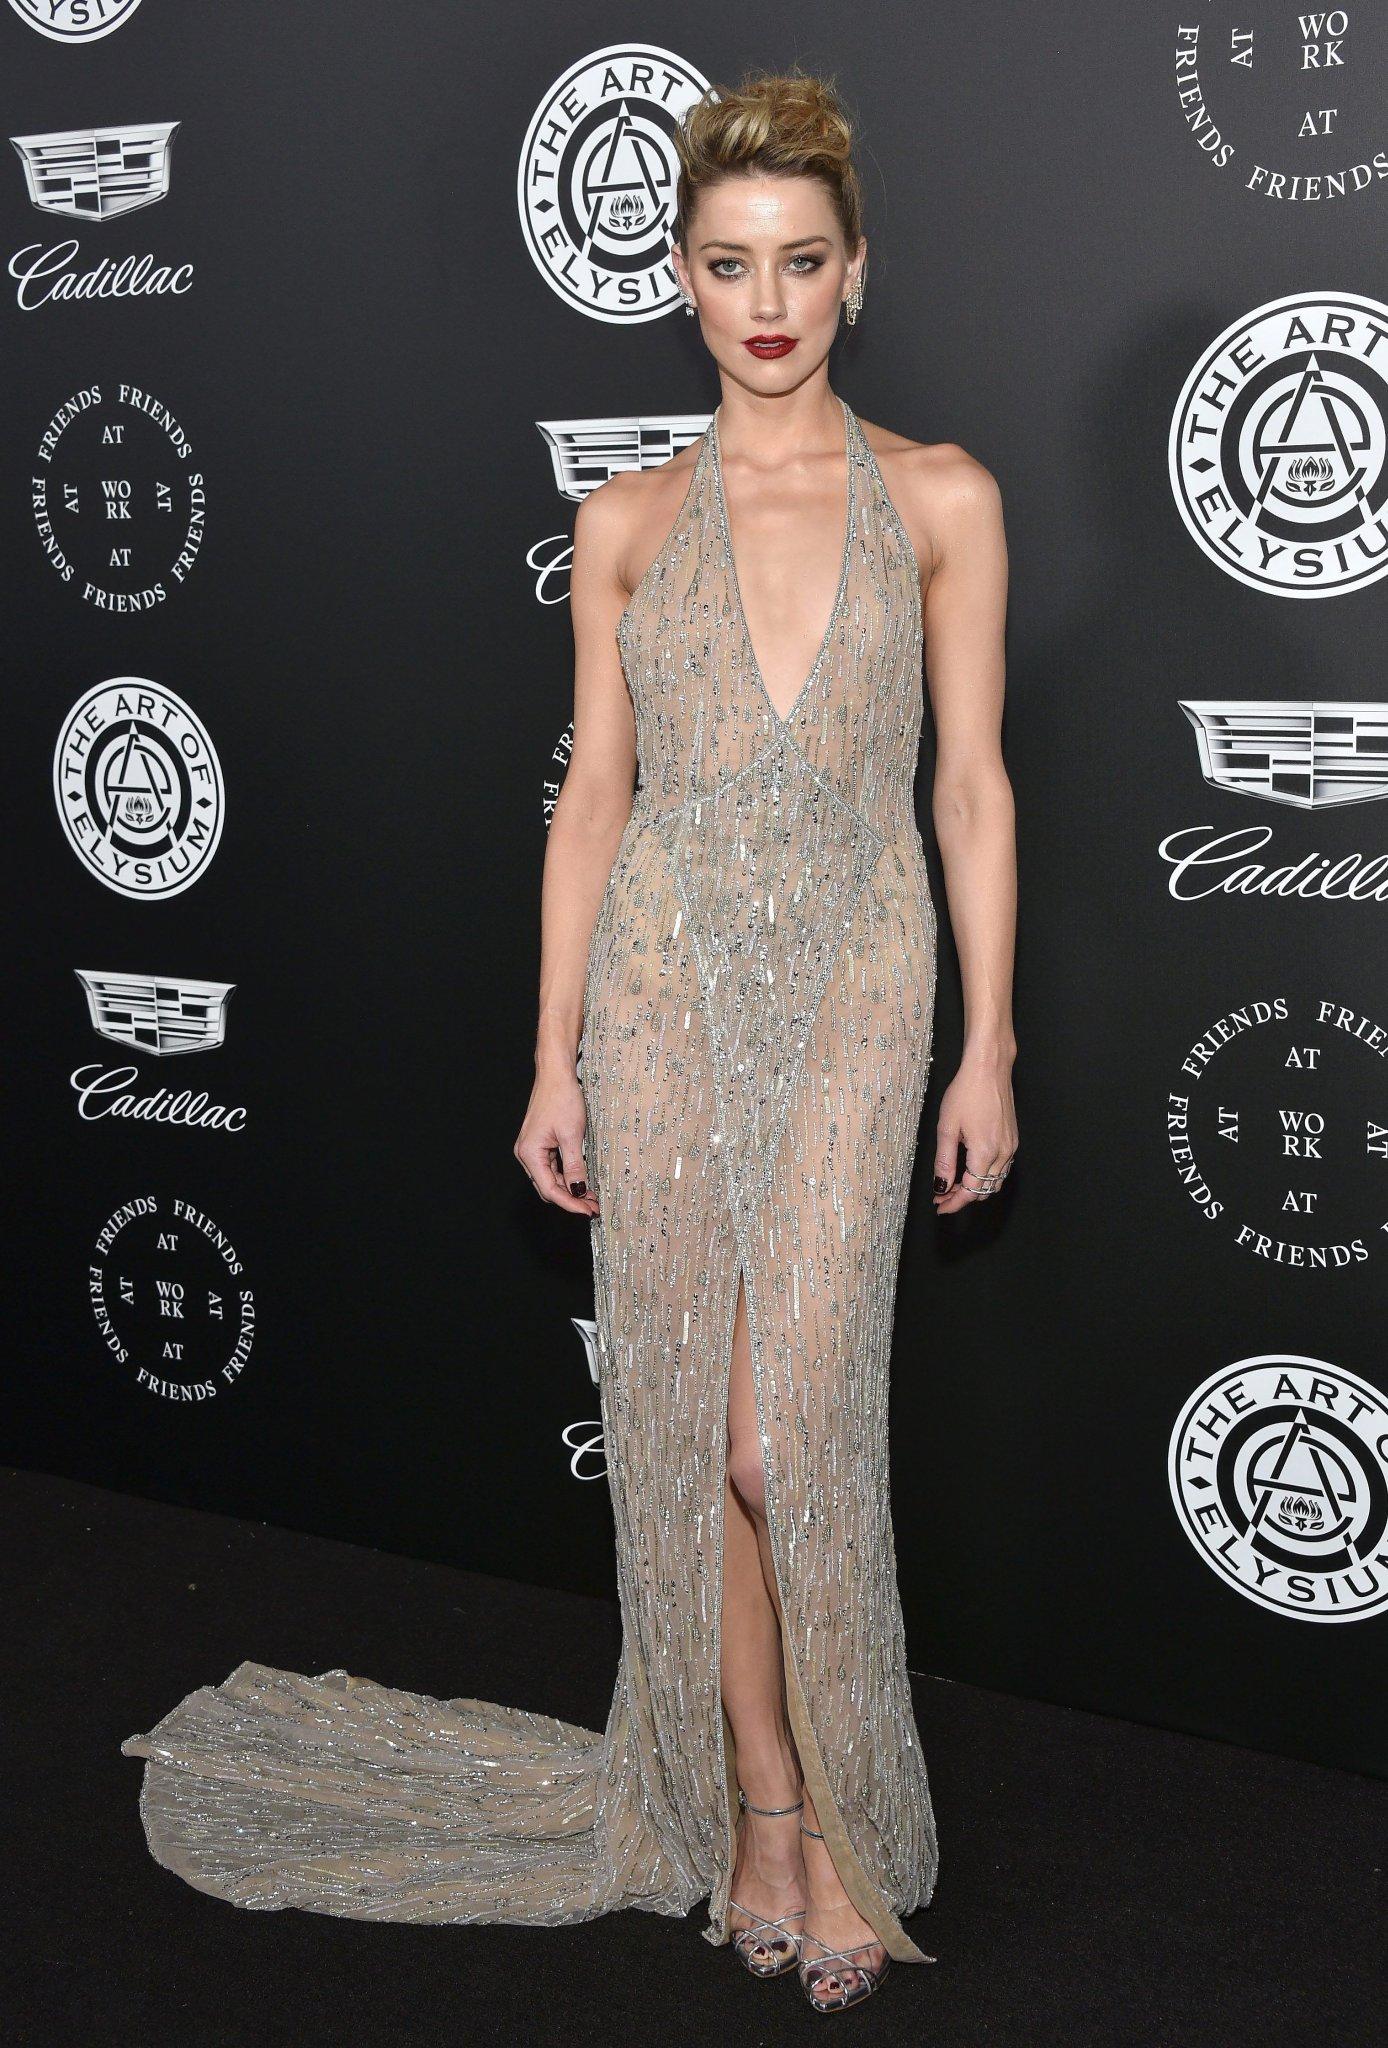 Amber Heard Donates Johnny Depp Divorce Money To Children's Hospital - Fame10